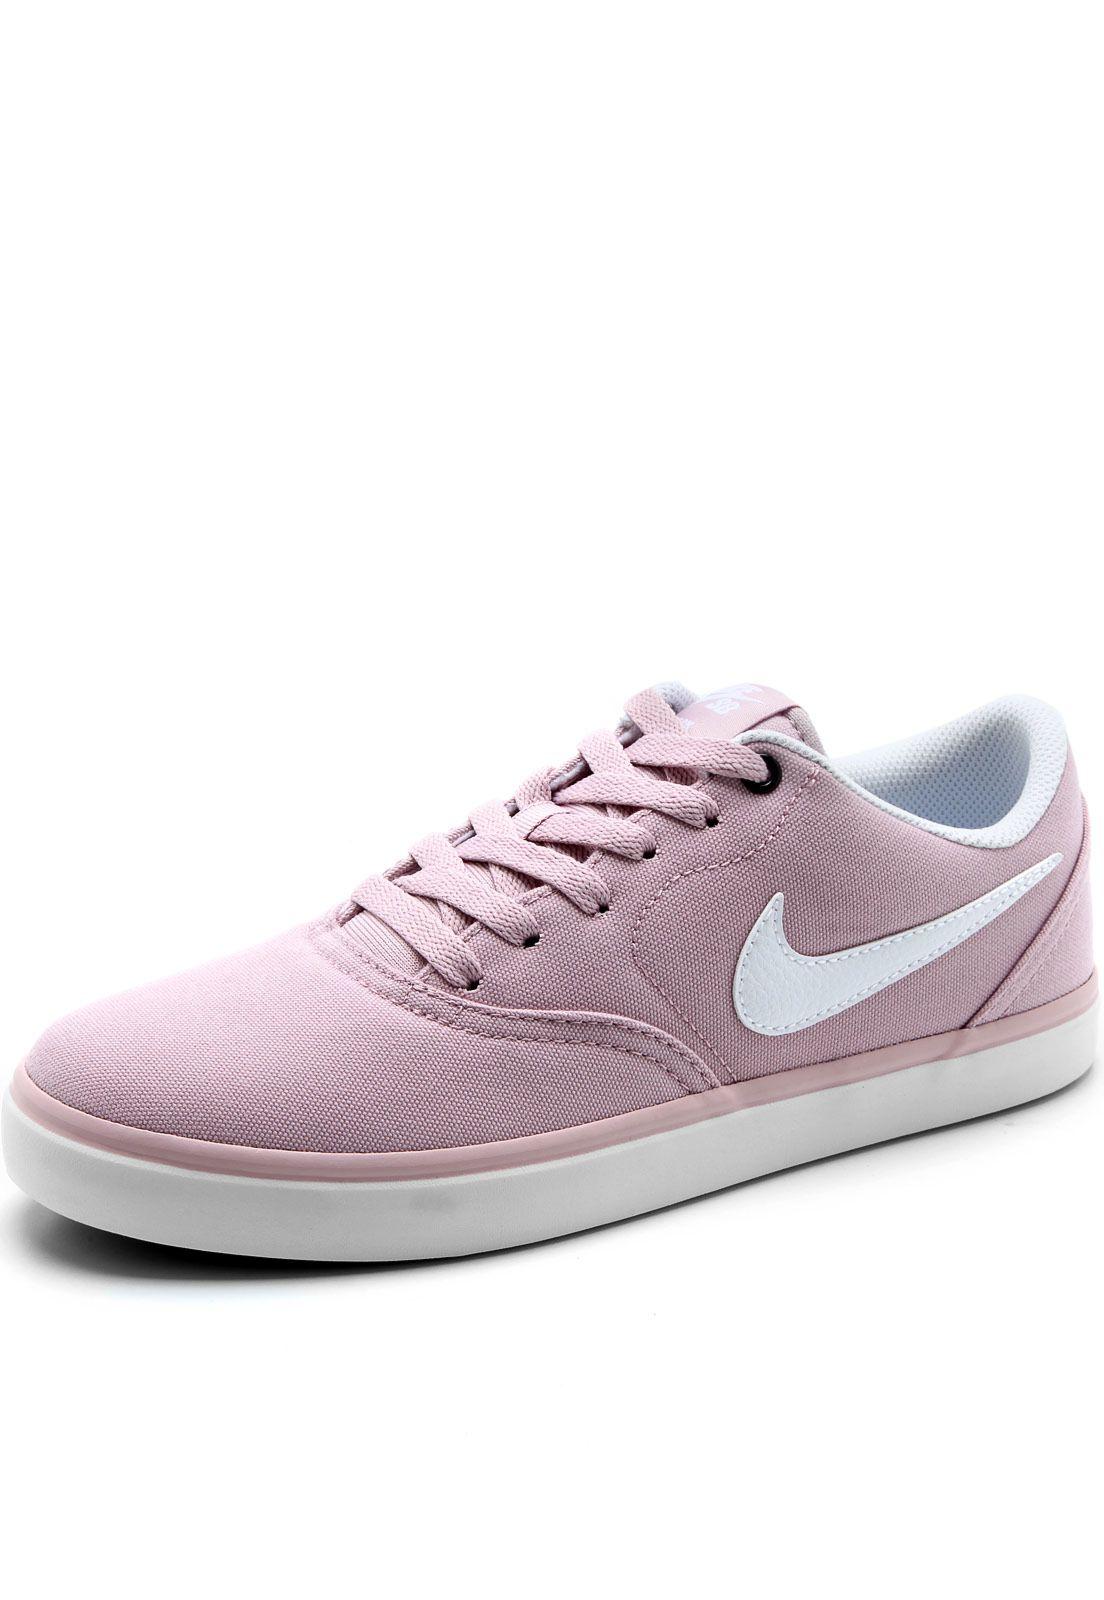 Tenis Nike Sb Check Solar C Rosa Branco Tenis Nike Nike Sb E Tenis Nike Sb Check